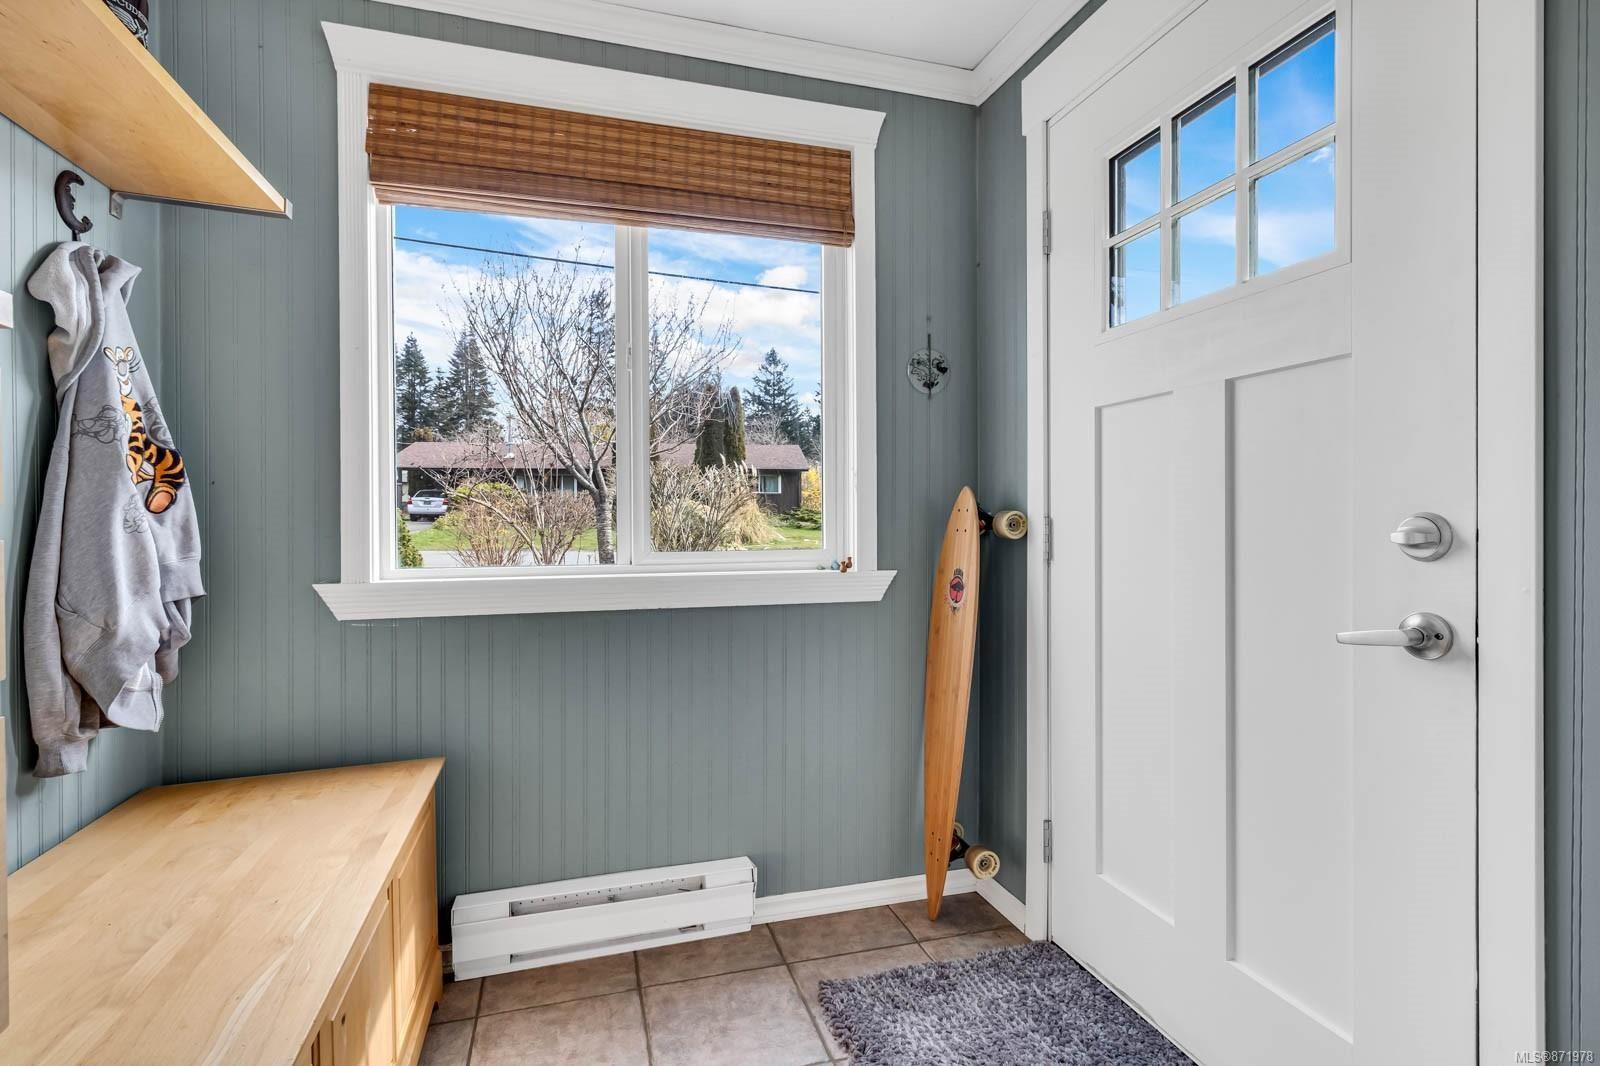 Photo 13: Photos: 1539 Chilcotin Cres in : CV Comox (Town of) House for sale (Comox Valley)  : MLS®# 871978